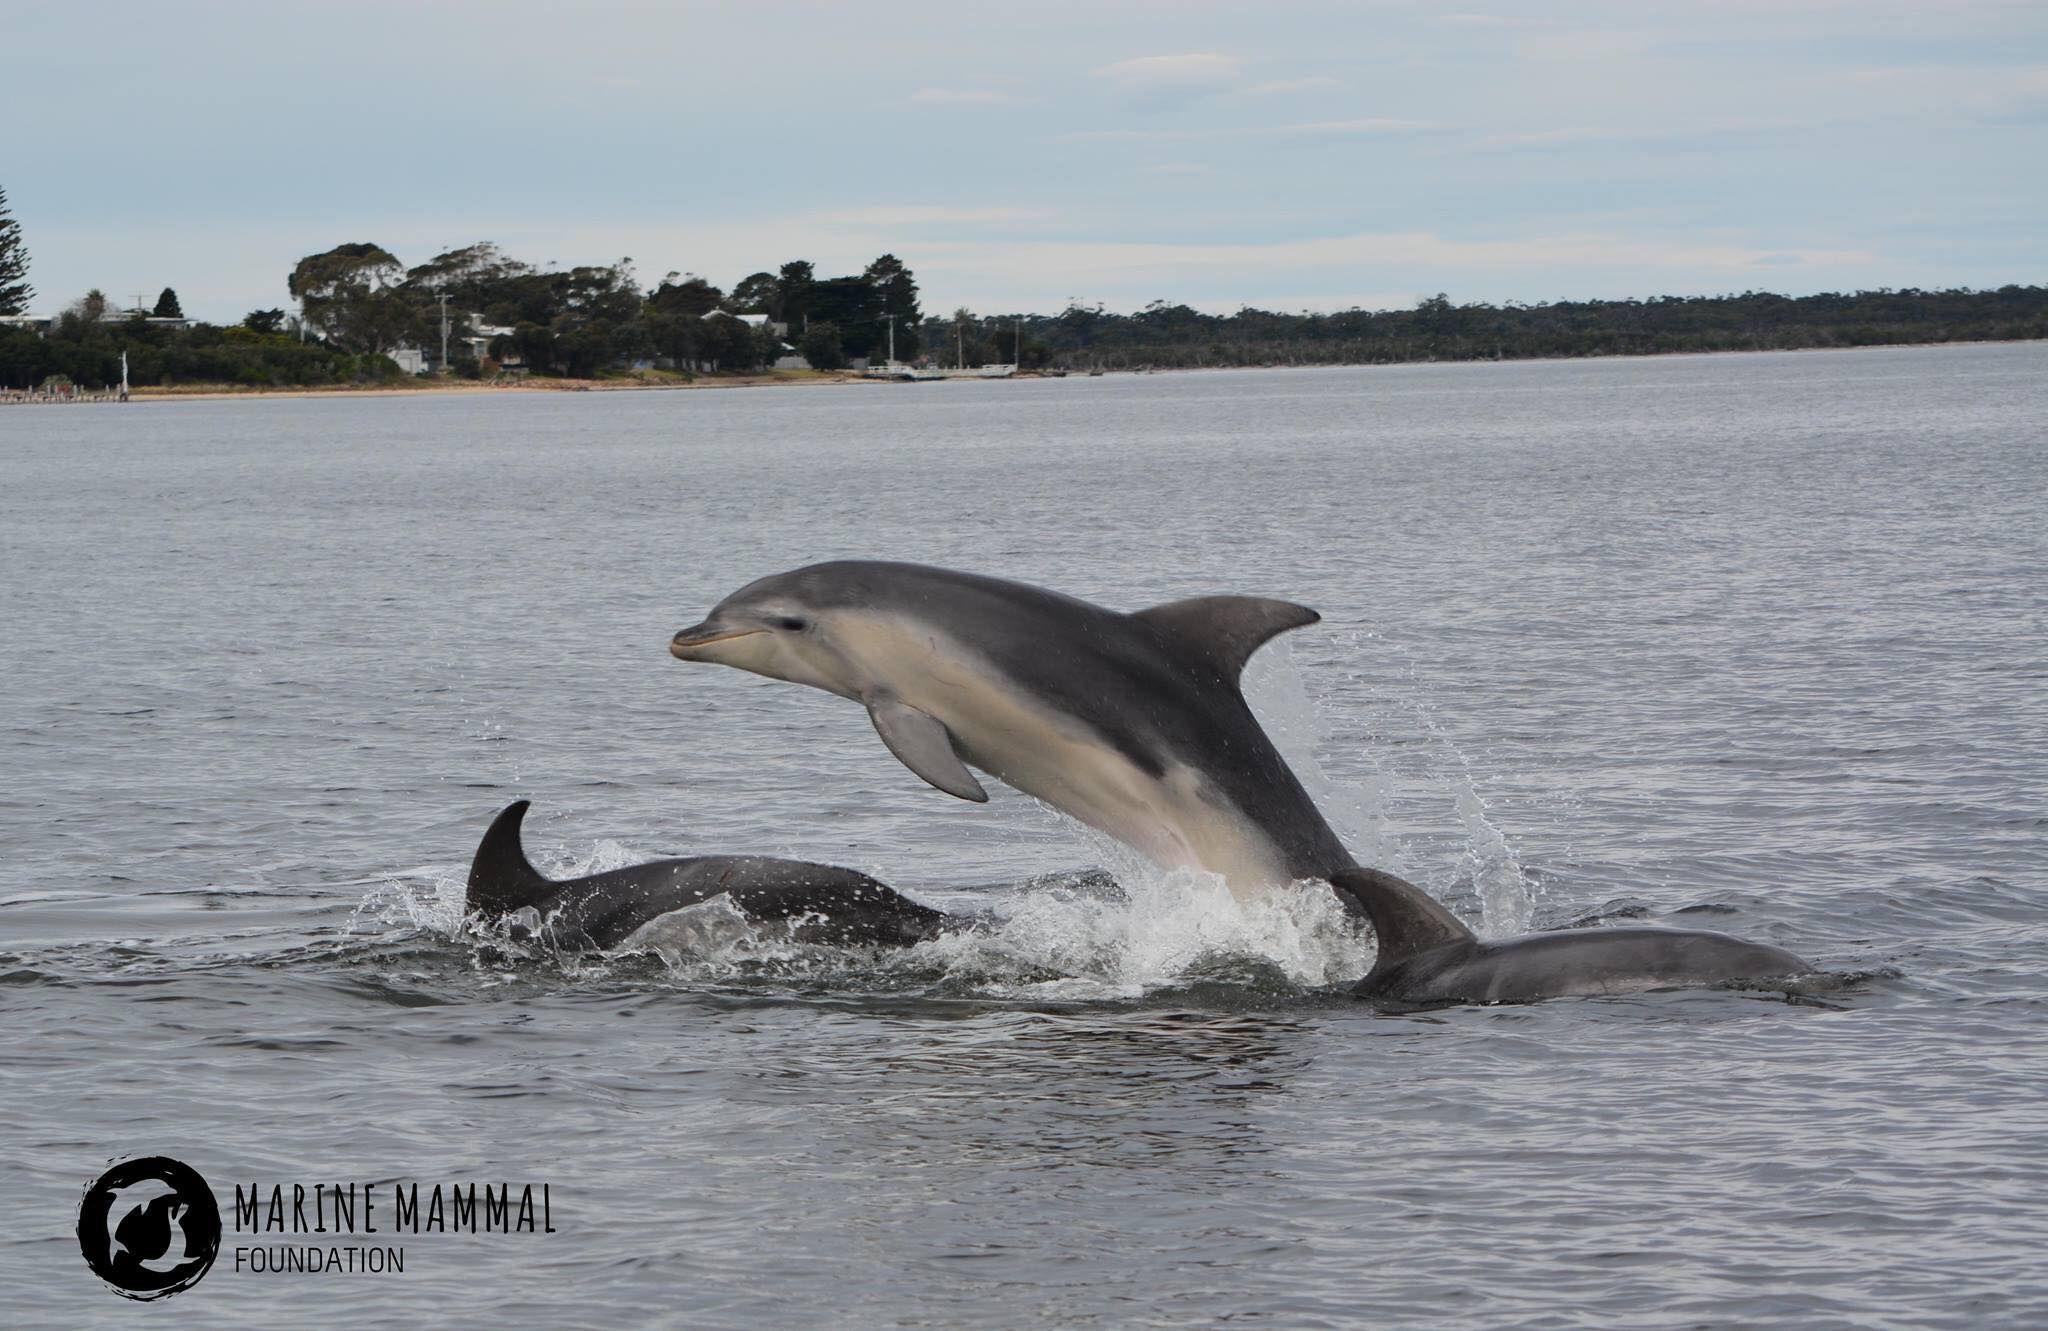 Burranan dolphin in Gippsland Lakes